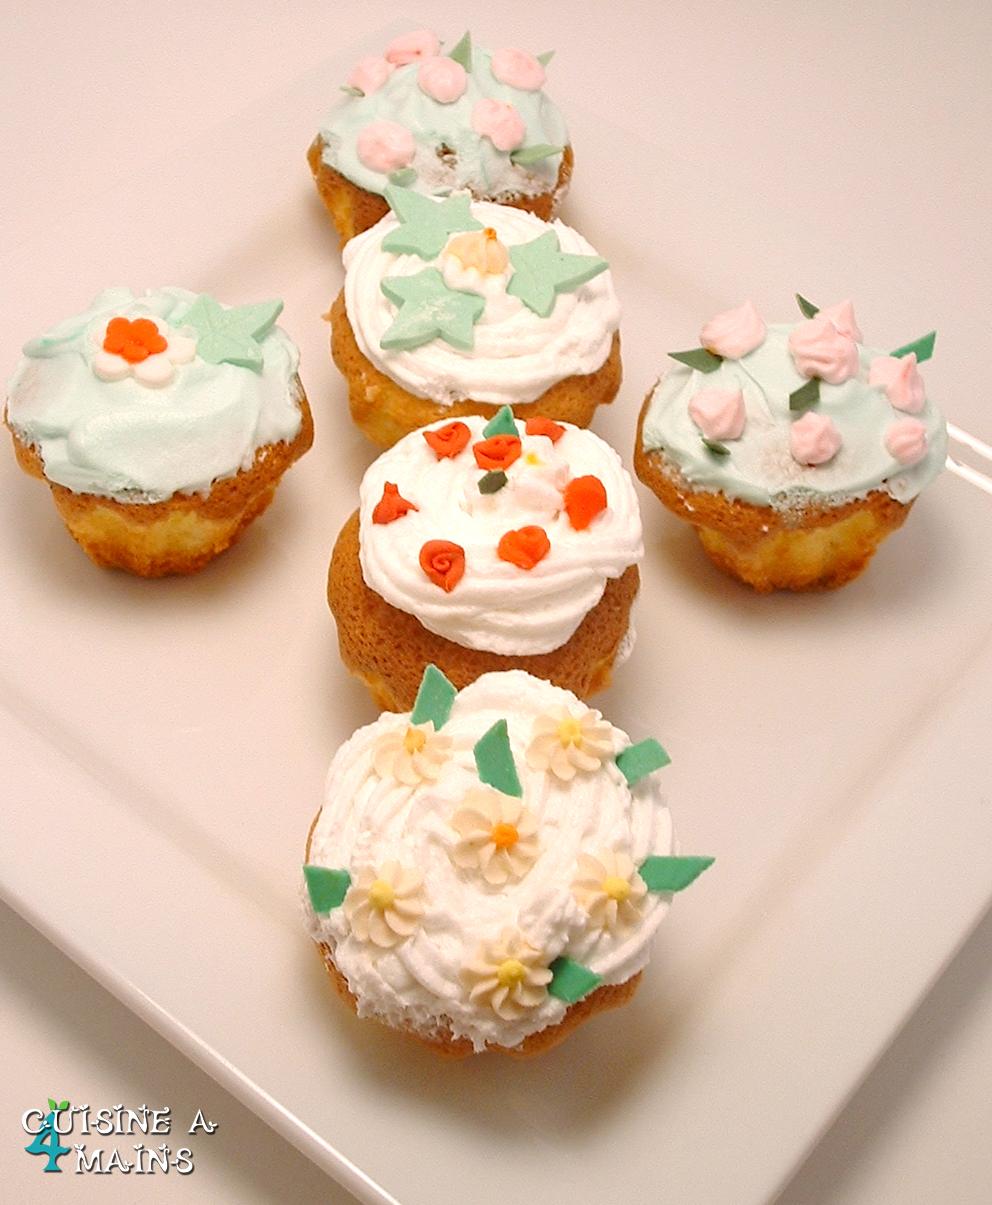 Cupcakes printaniers cuisine 4 mains for Cuisine 04 mains